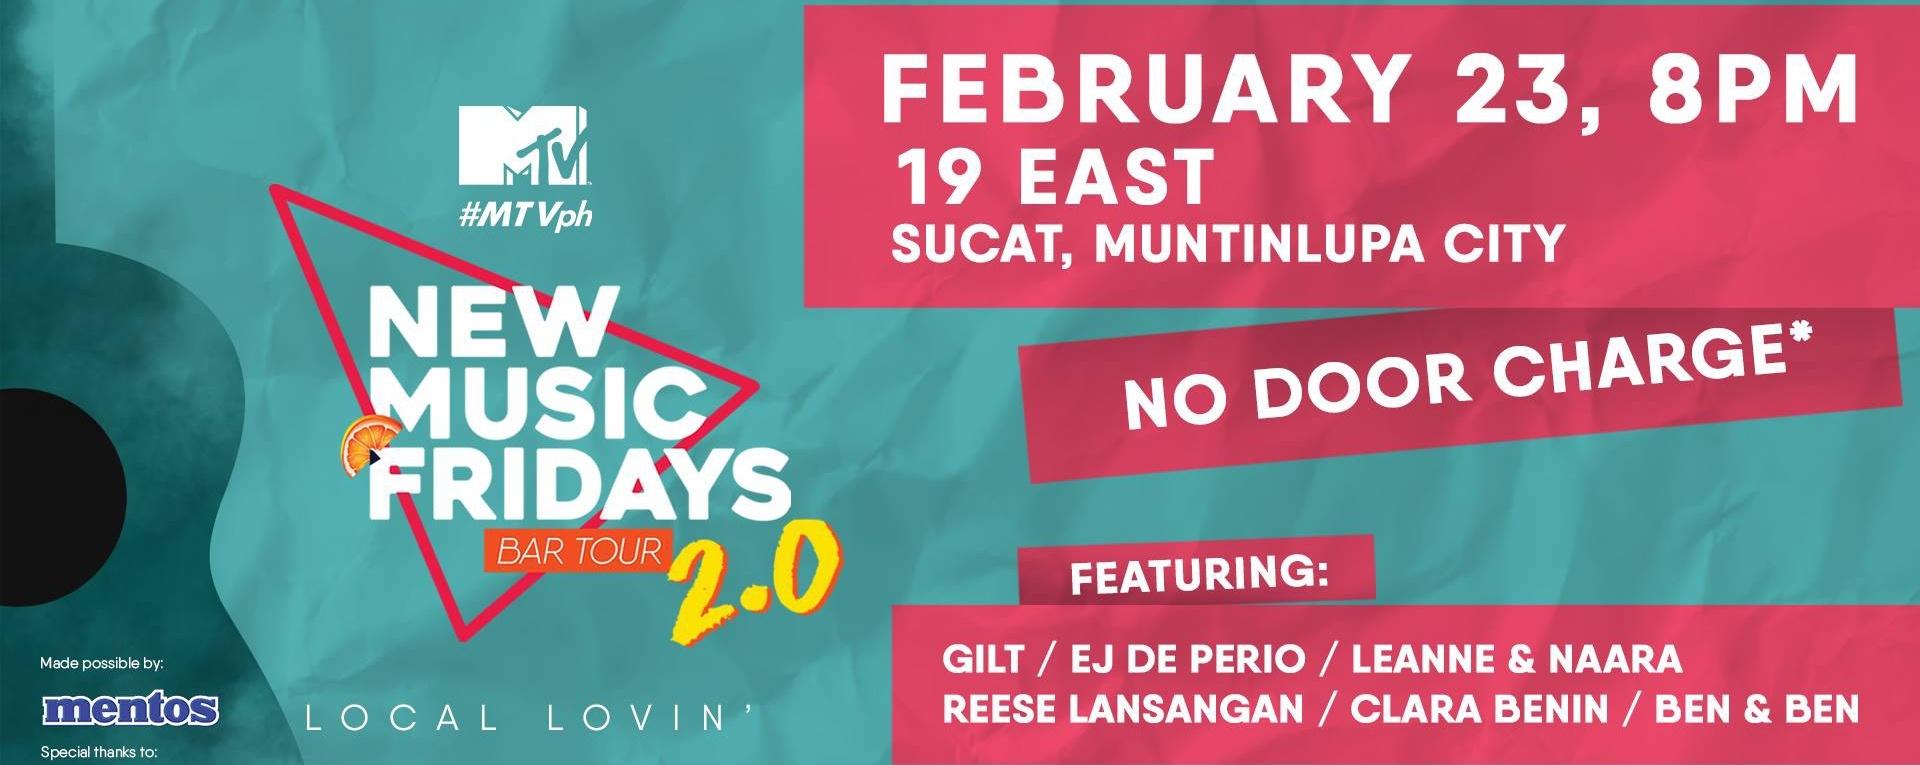 MTV New Music Fridays: #LocalLovin